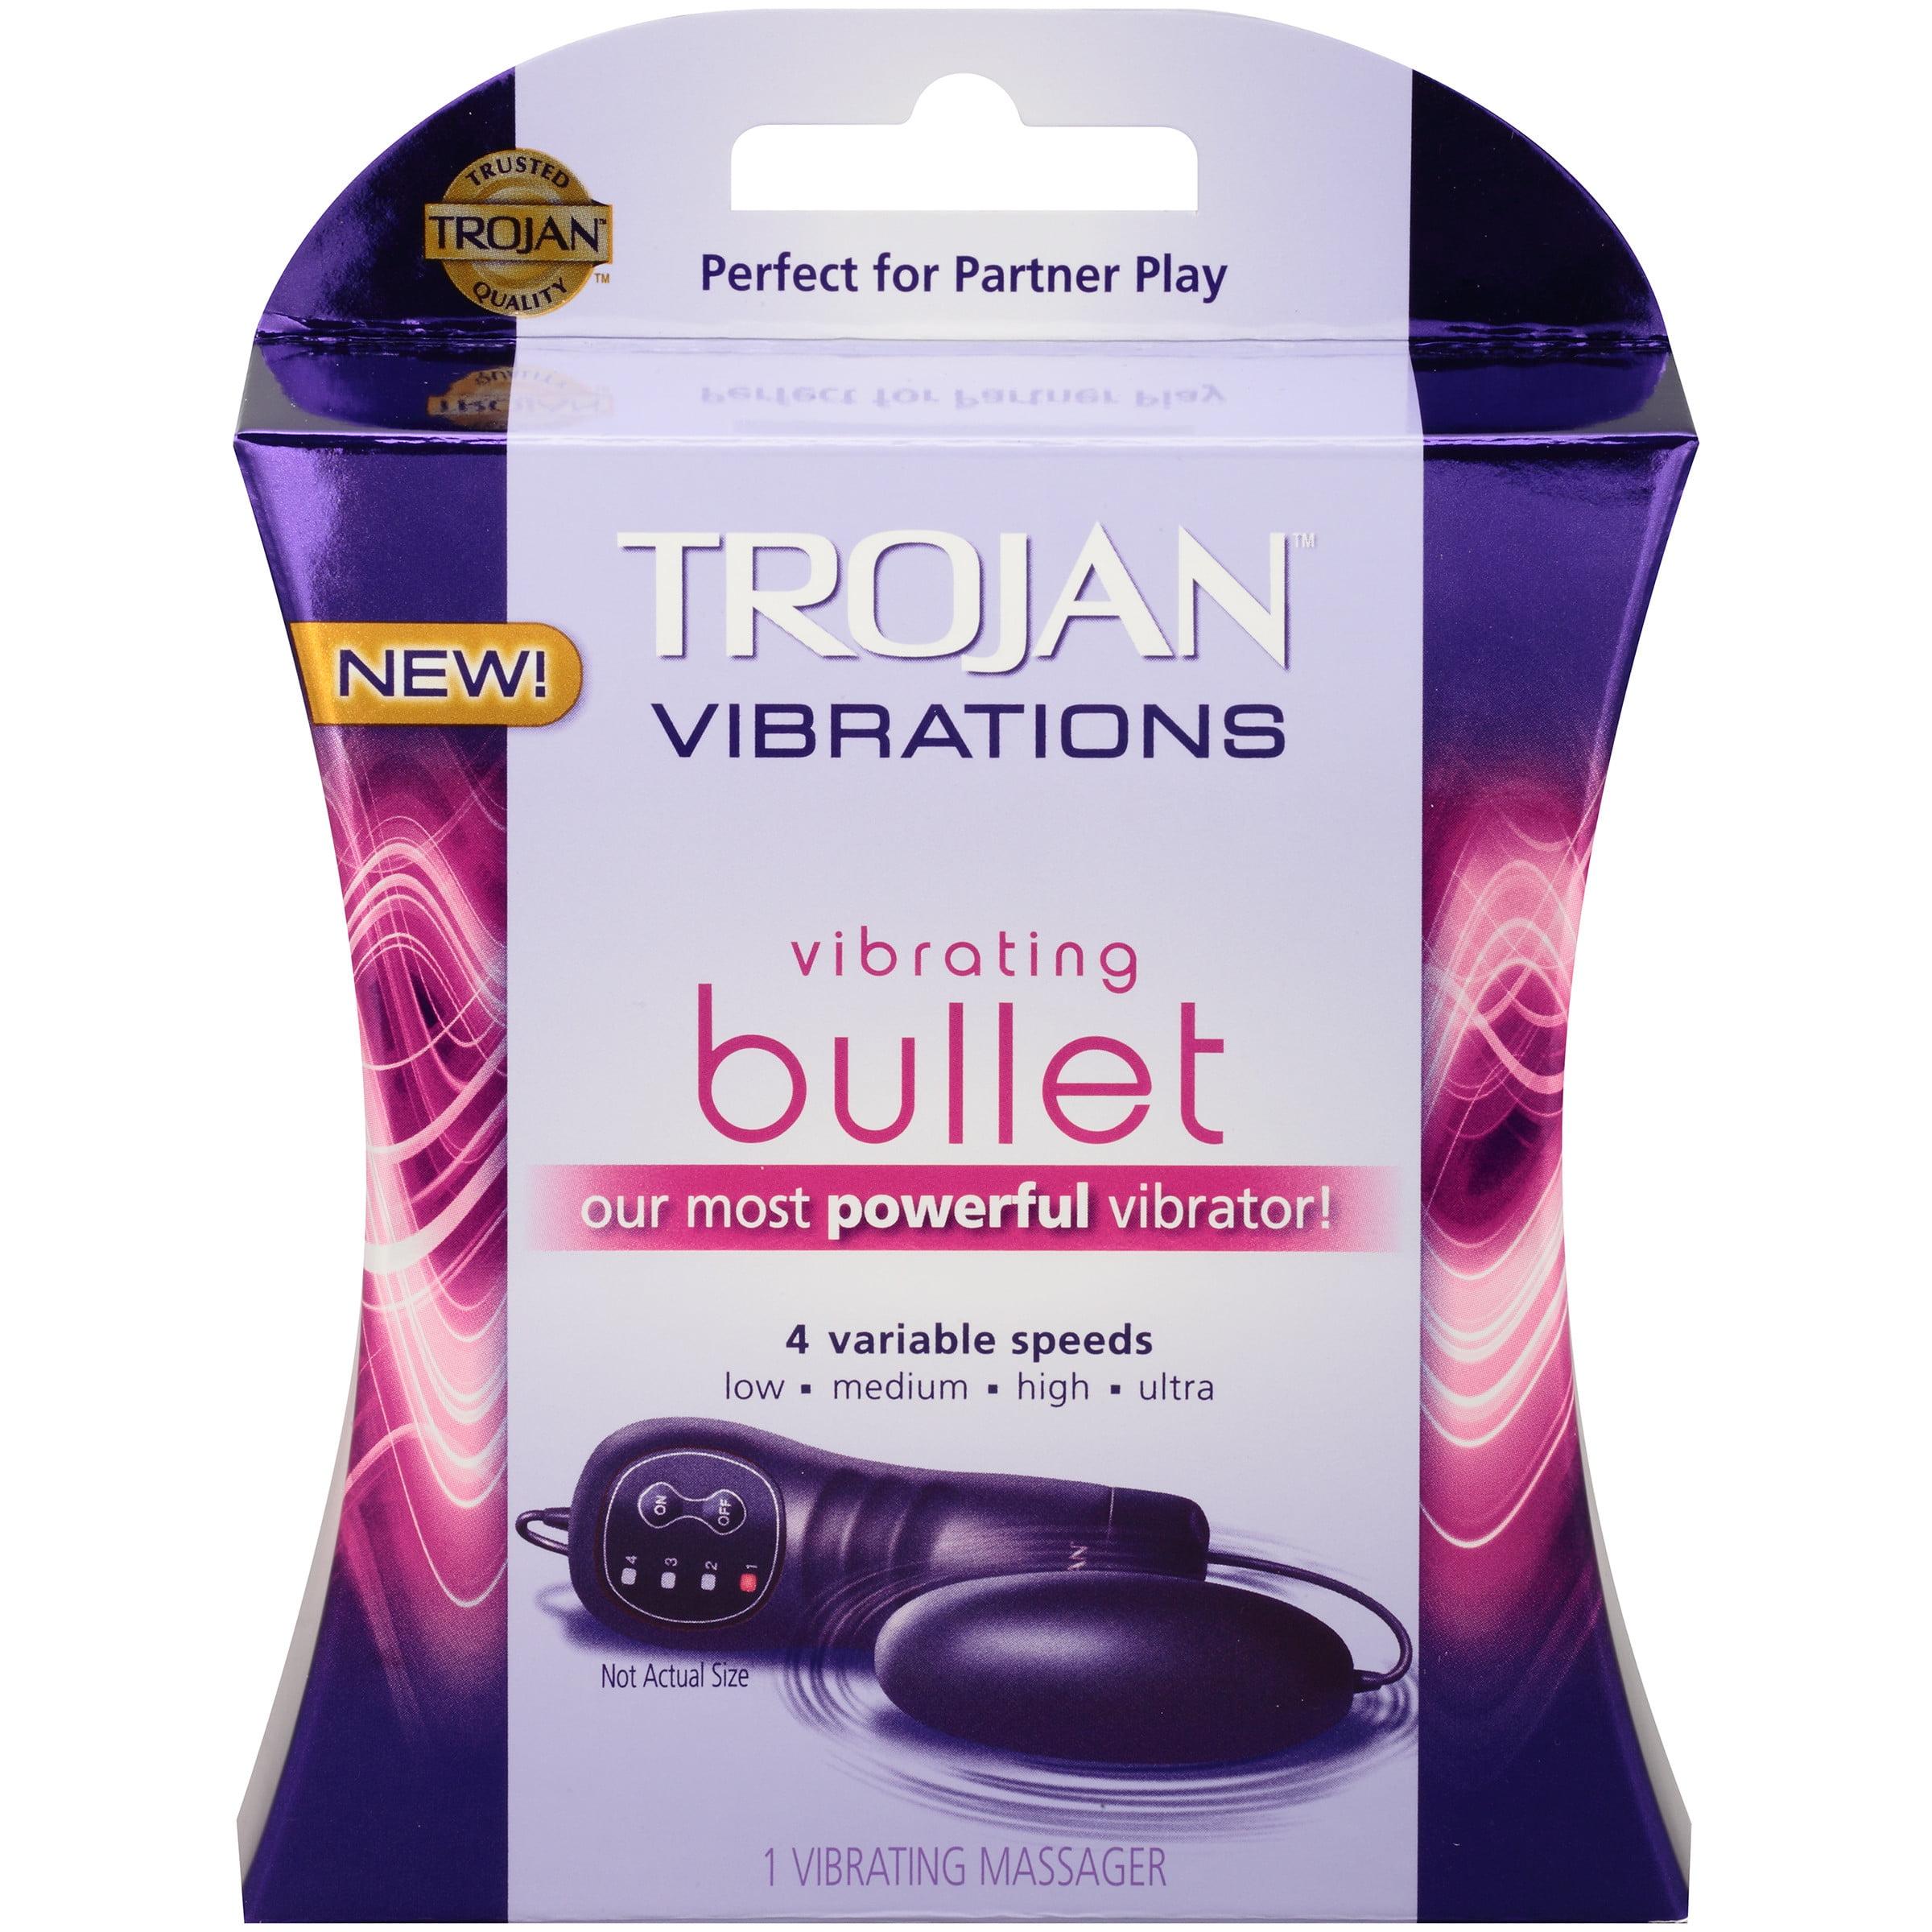 Trojan Vibrations Vibrating Bullet Personal Massager